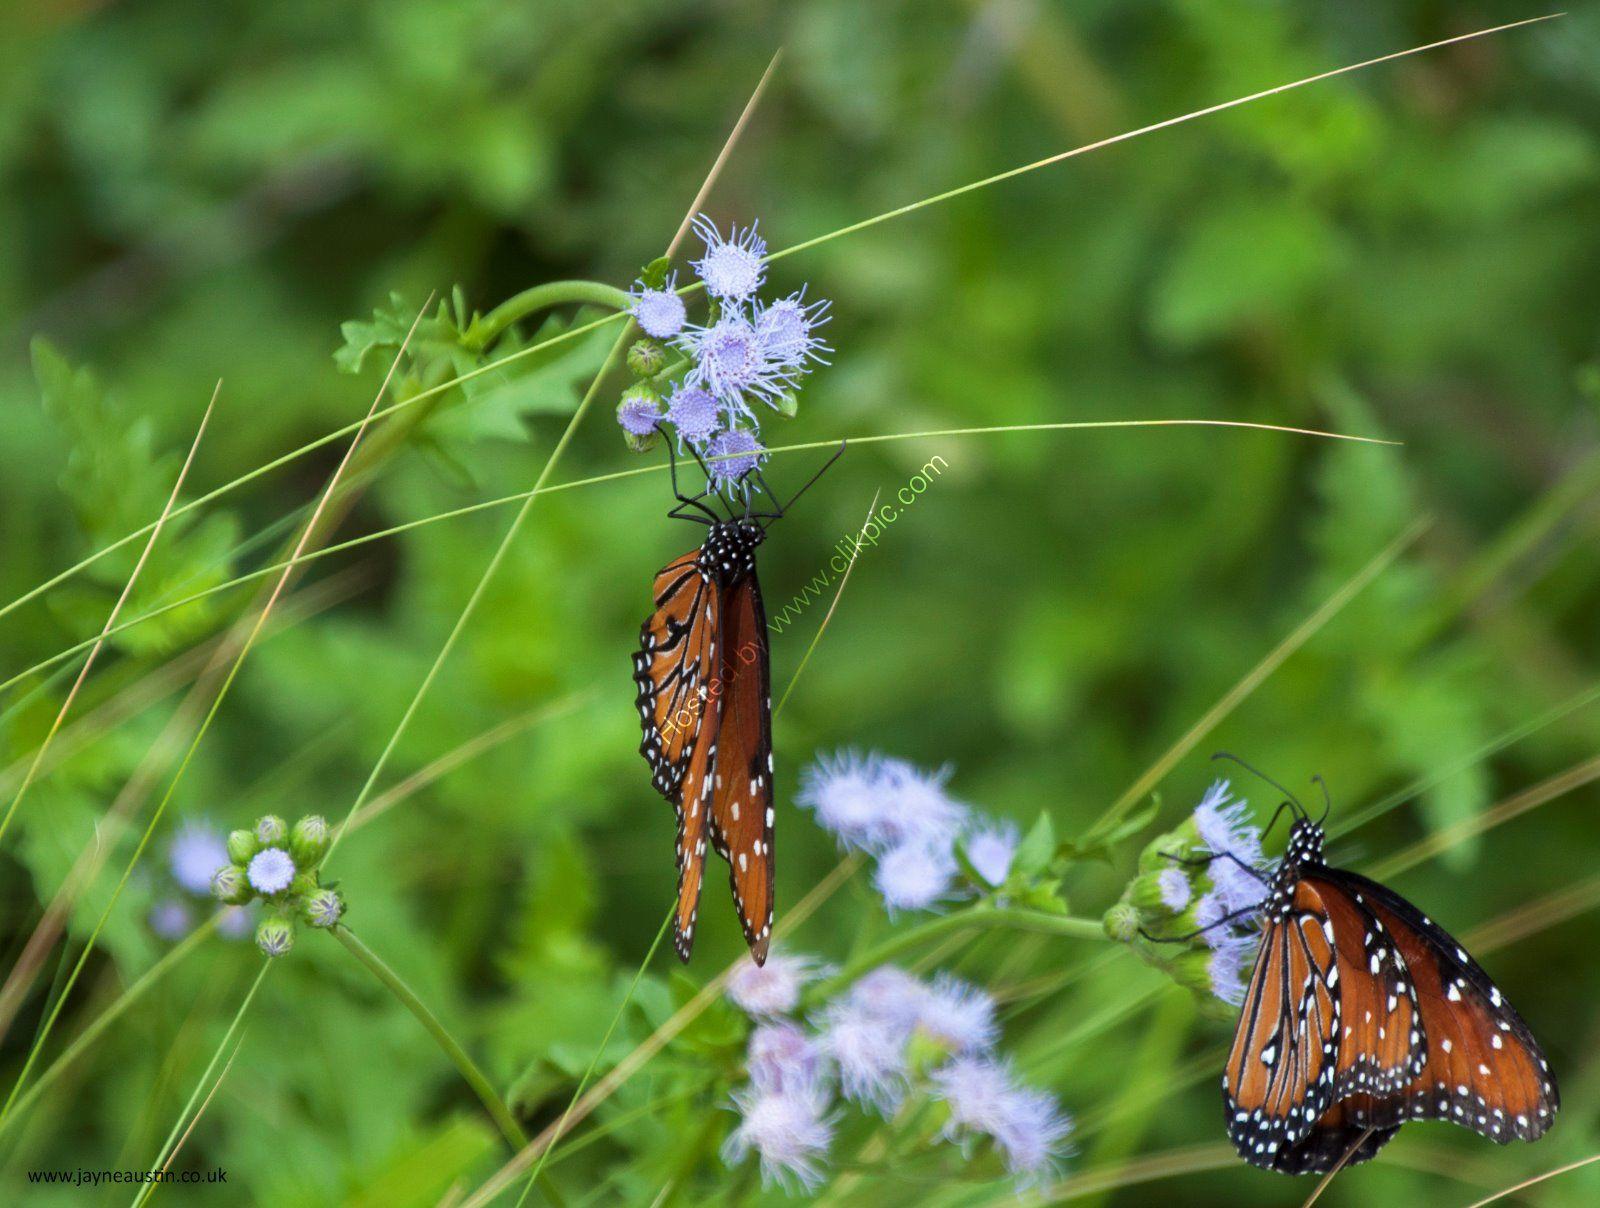 14. Phoenix - Botanical Gardens